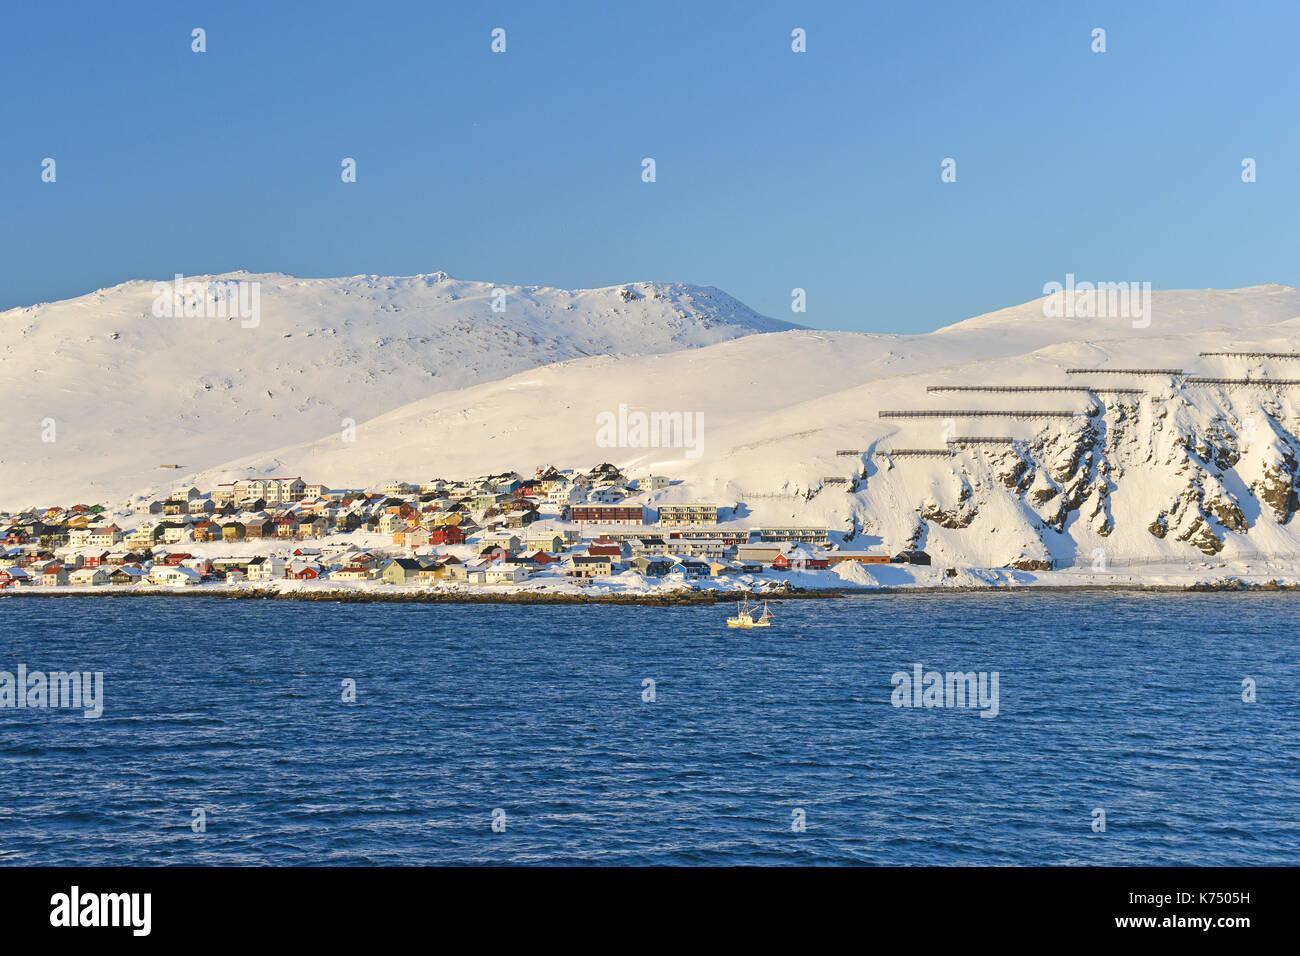 Town of Honningsvåg, Island Magerøya, Finnmark, Norway - Stock Image